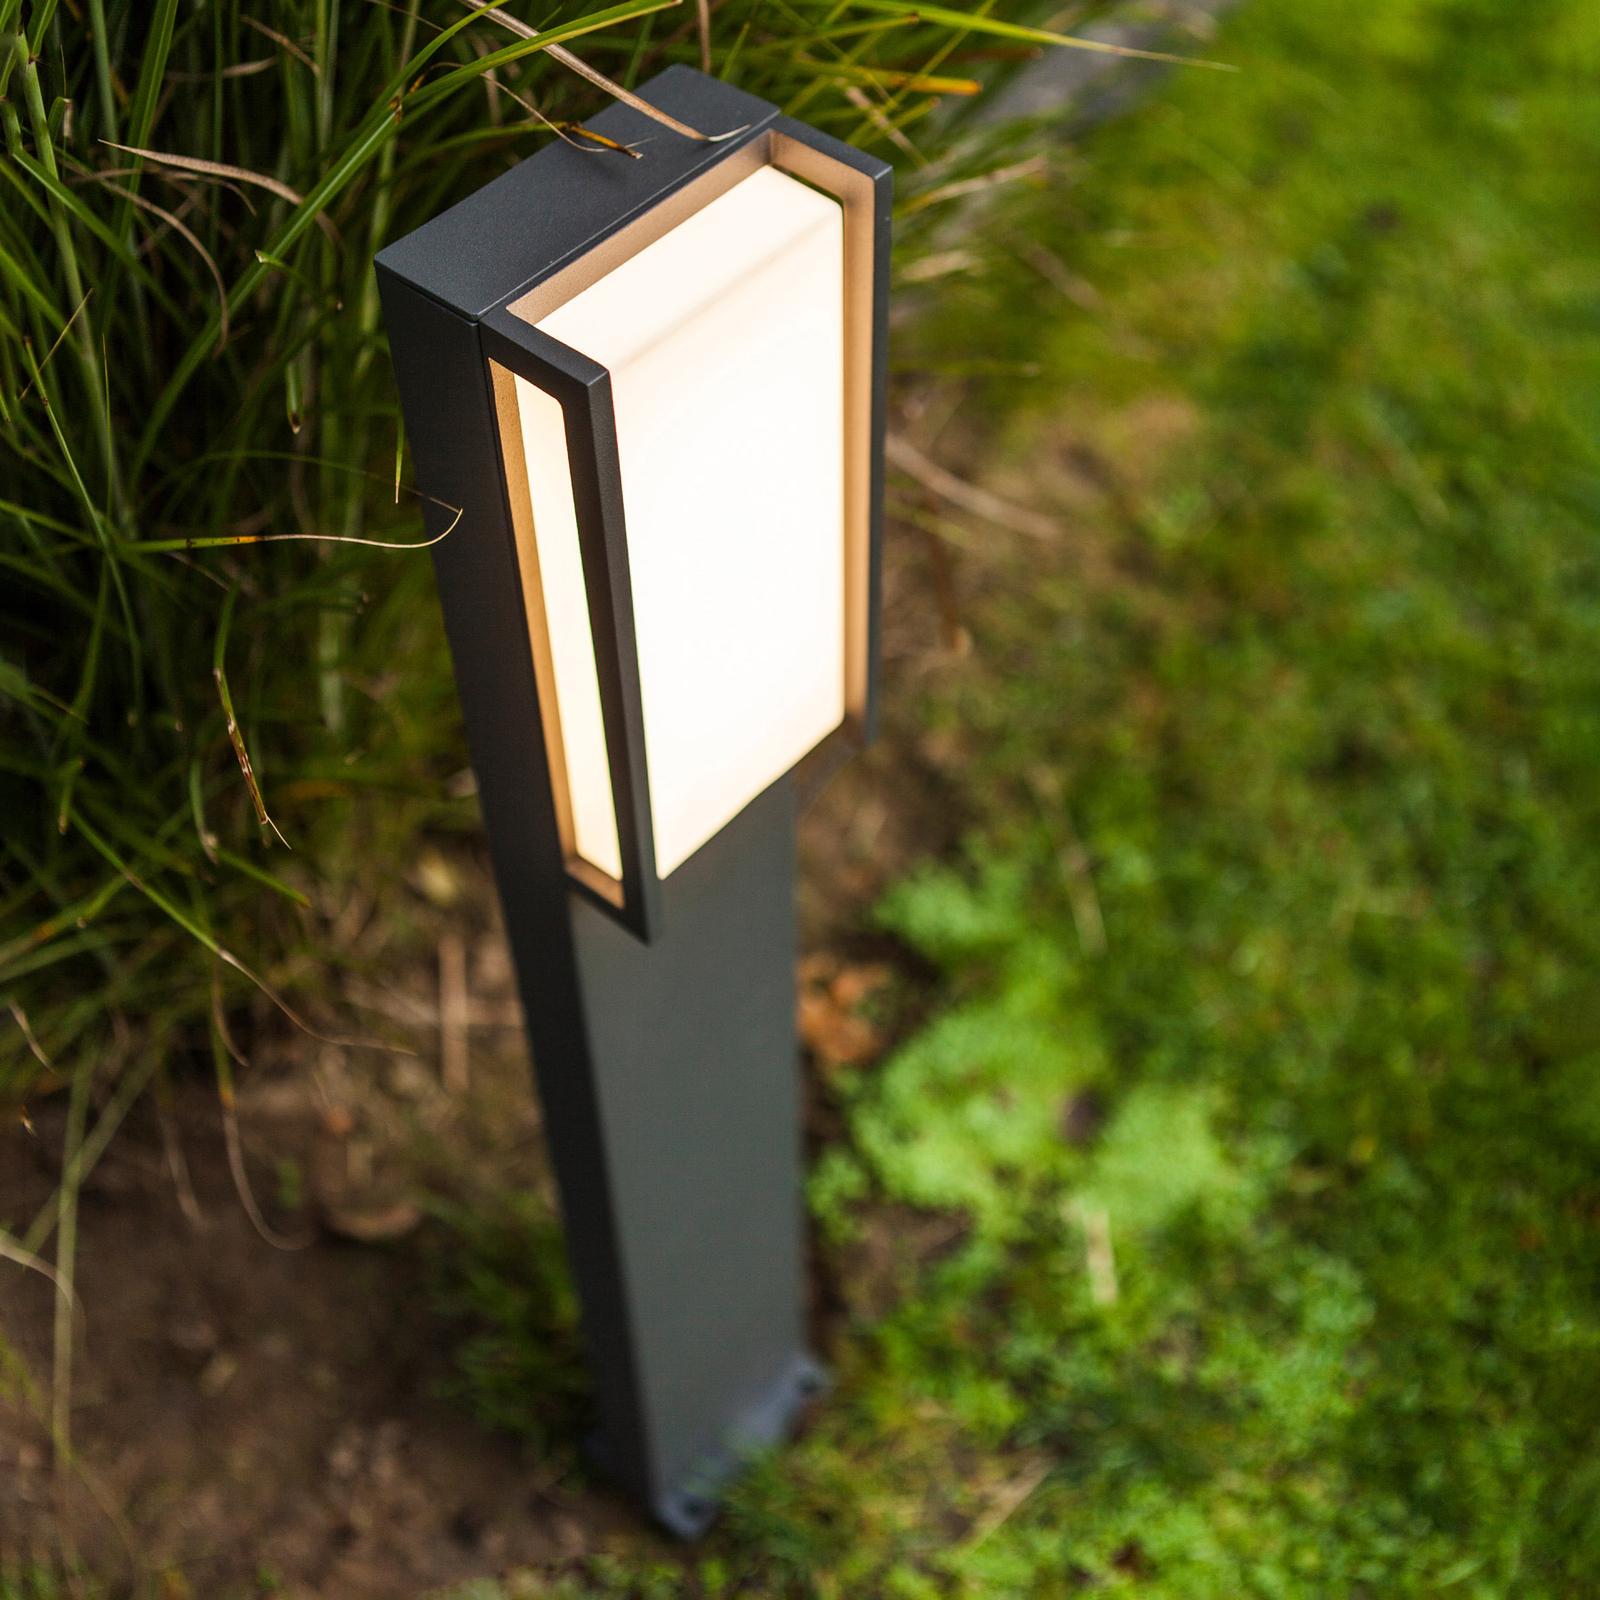 Qubo LED-veilampe, RGBW, smart kontrollerbar